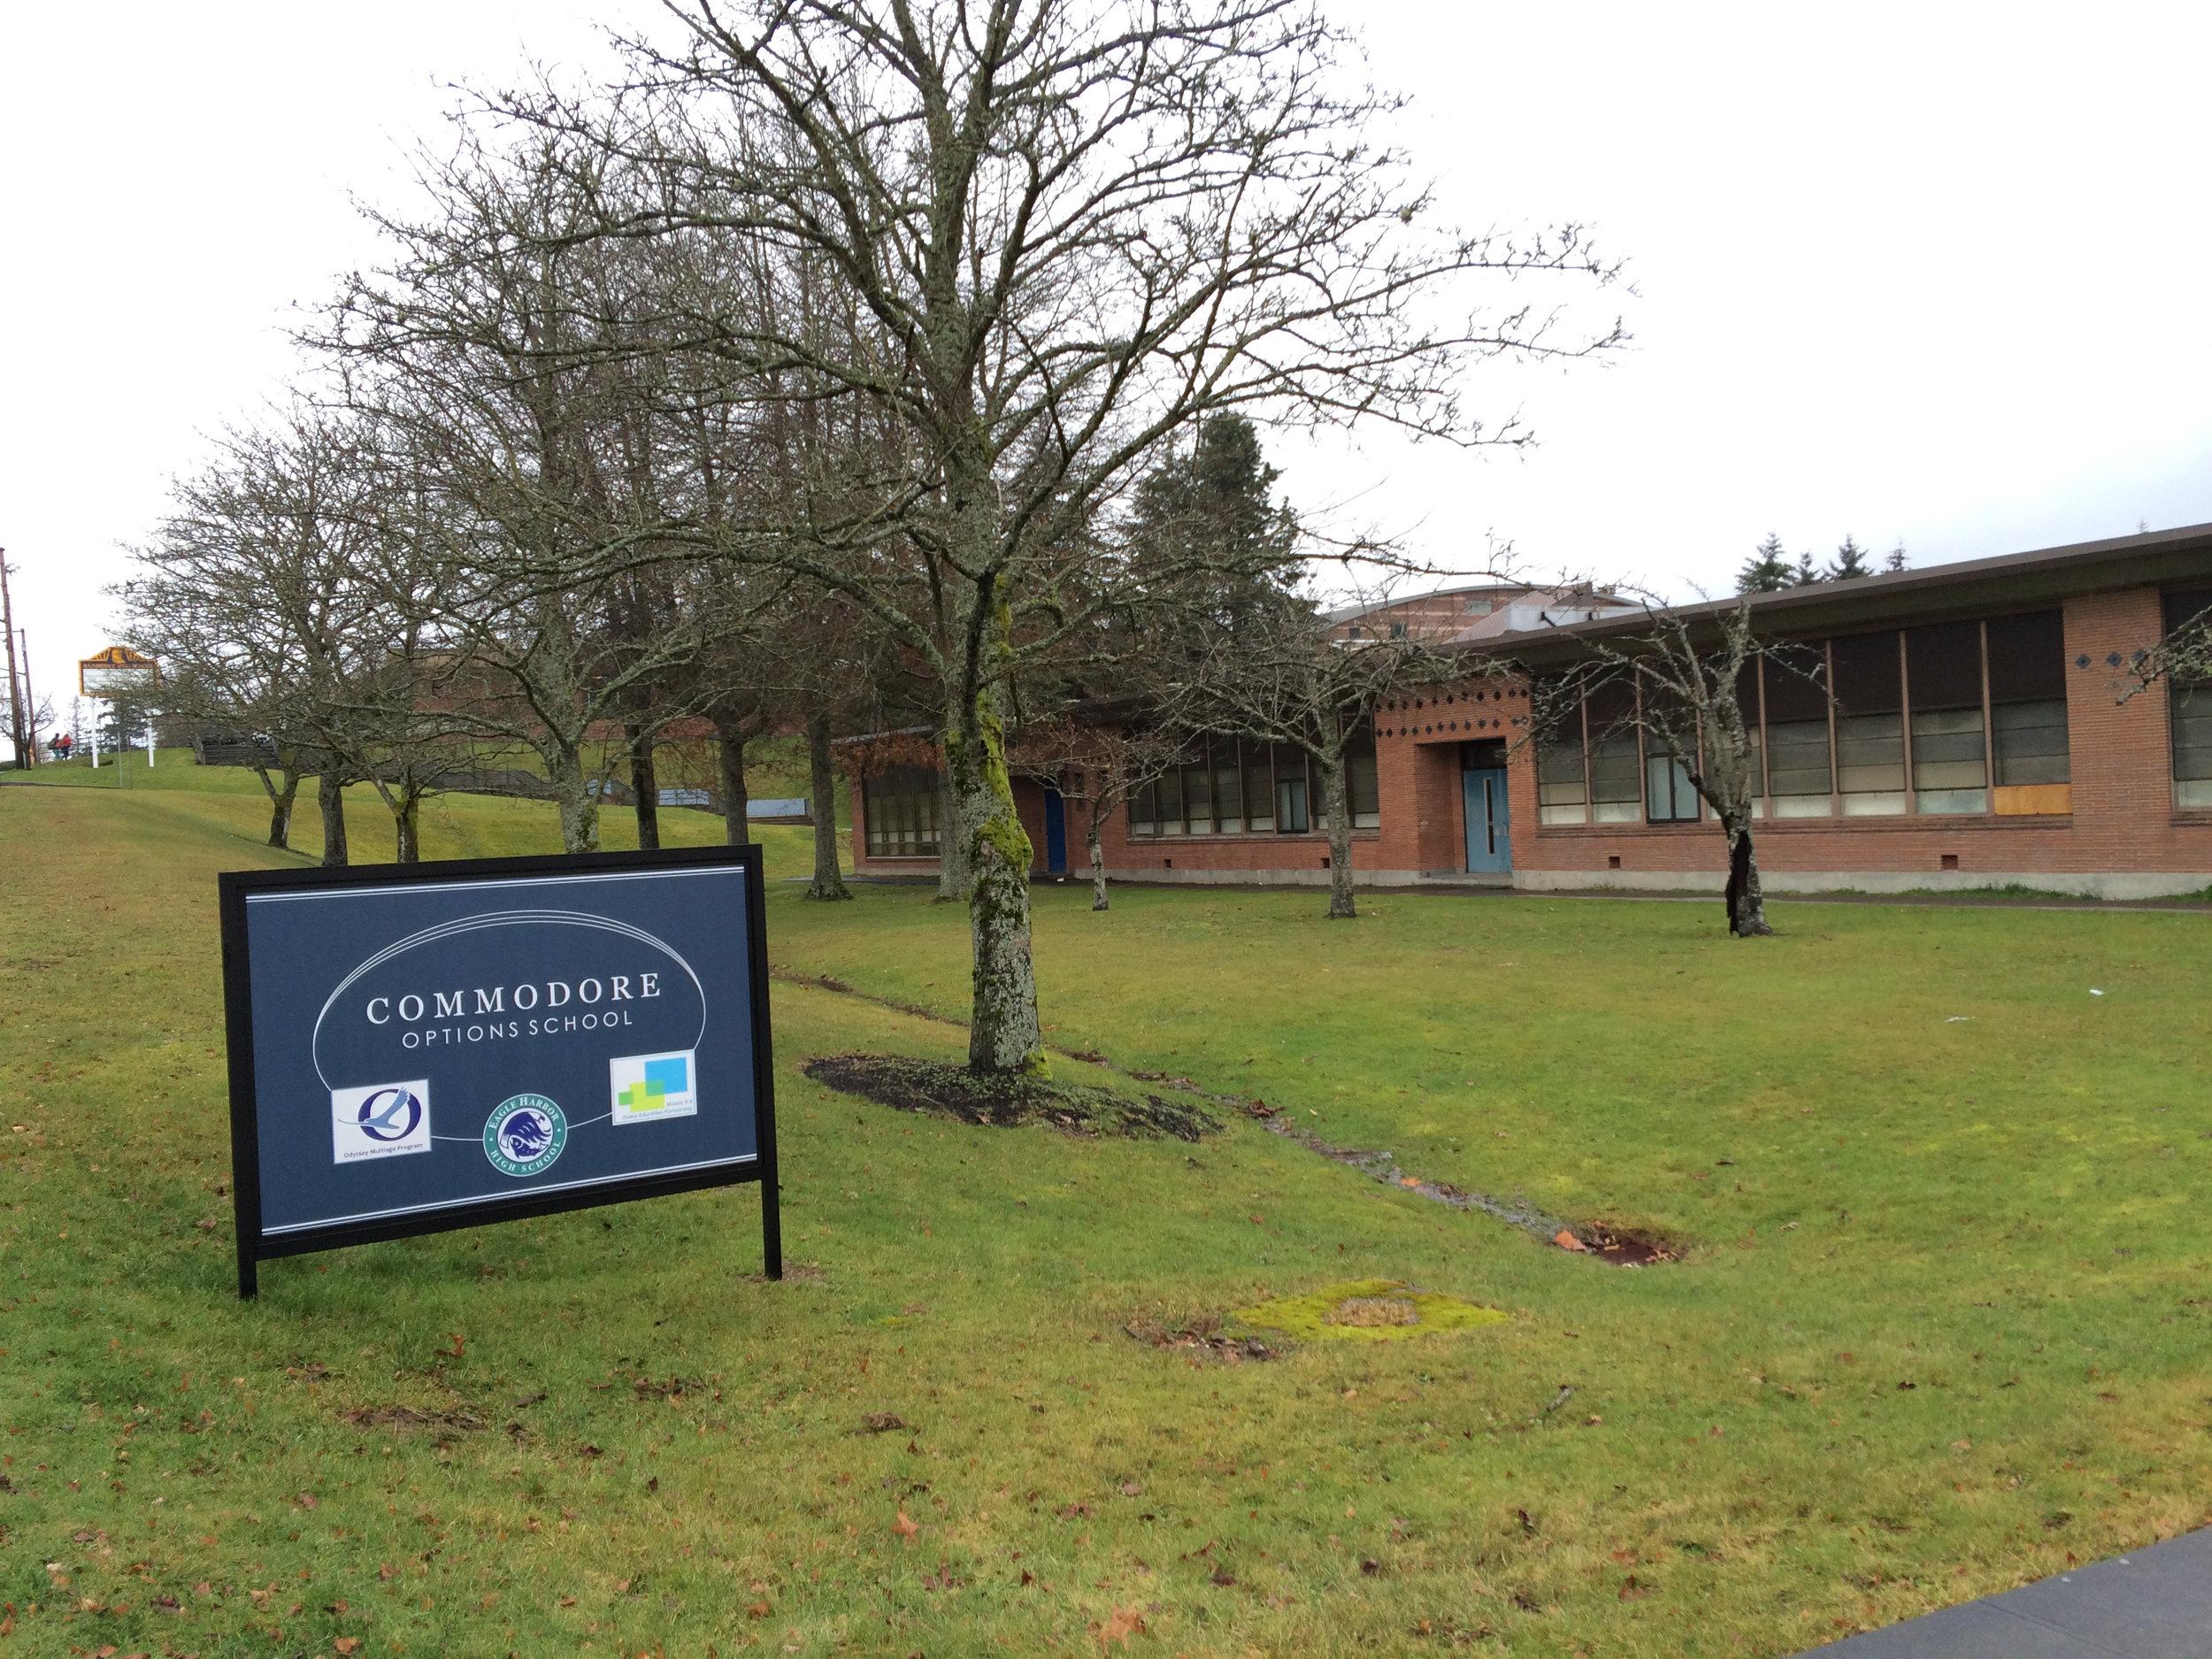 commodore options school, bainbridge island